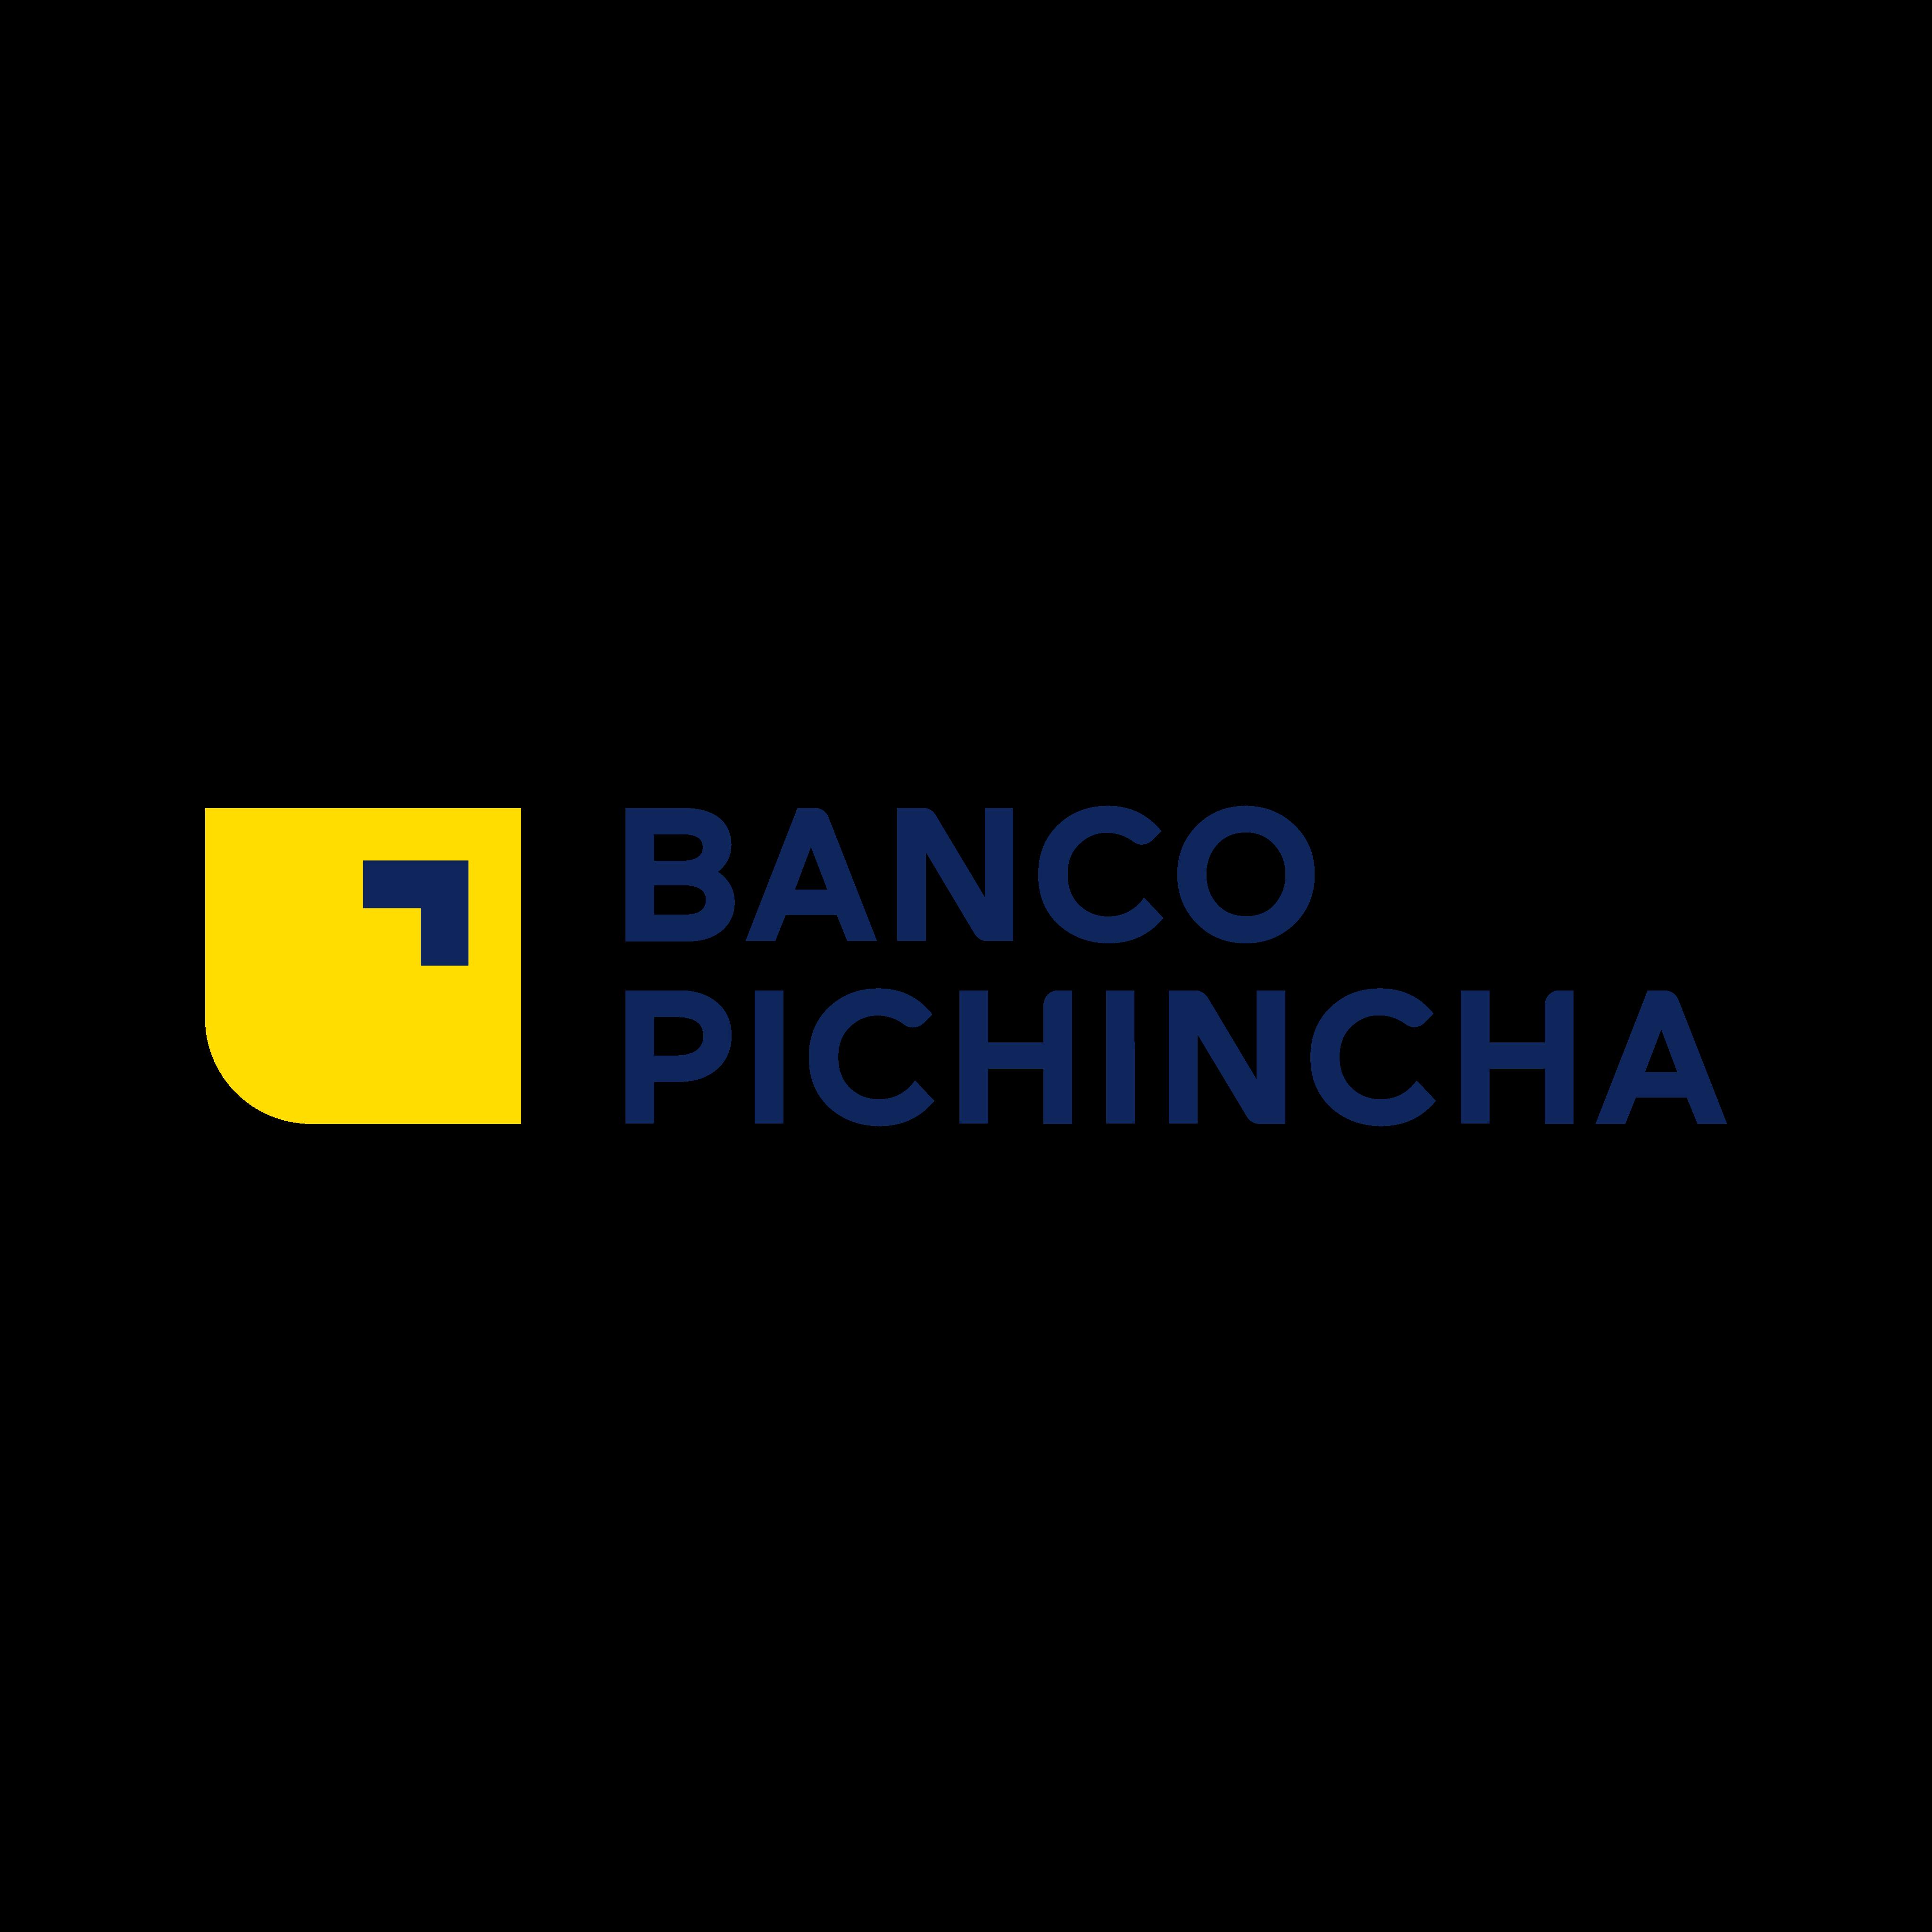 banco pichincha logo 0 - Banco Pichincha Logo